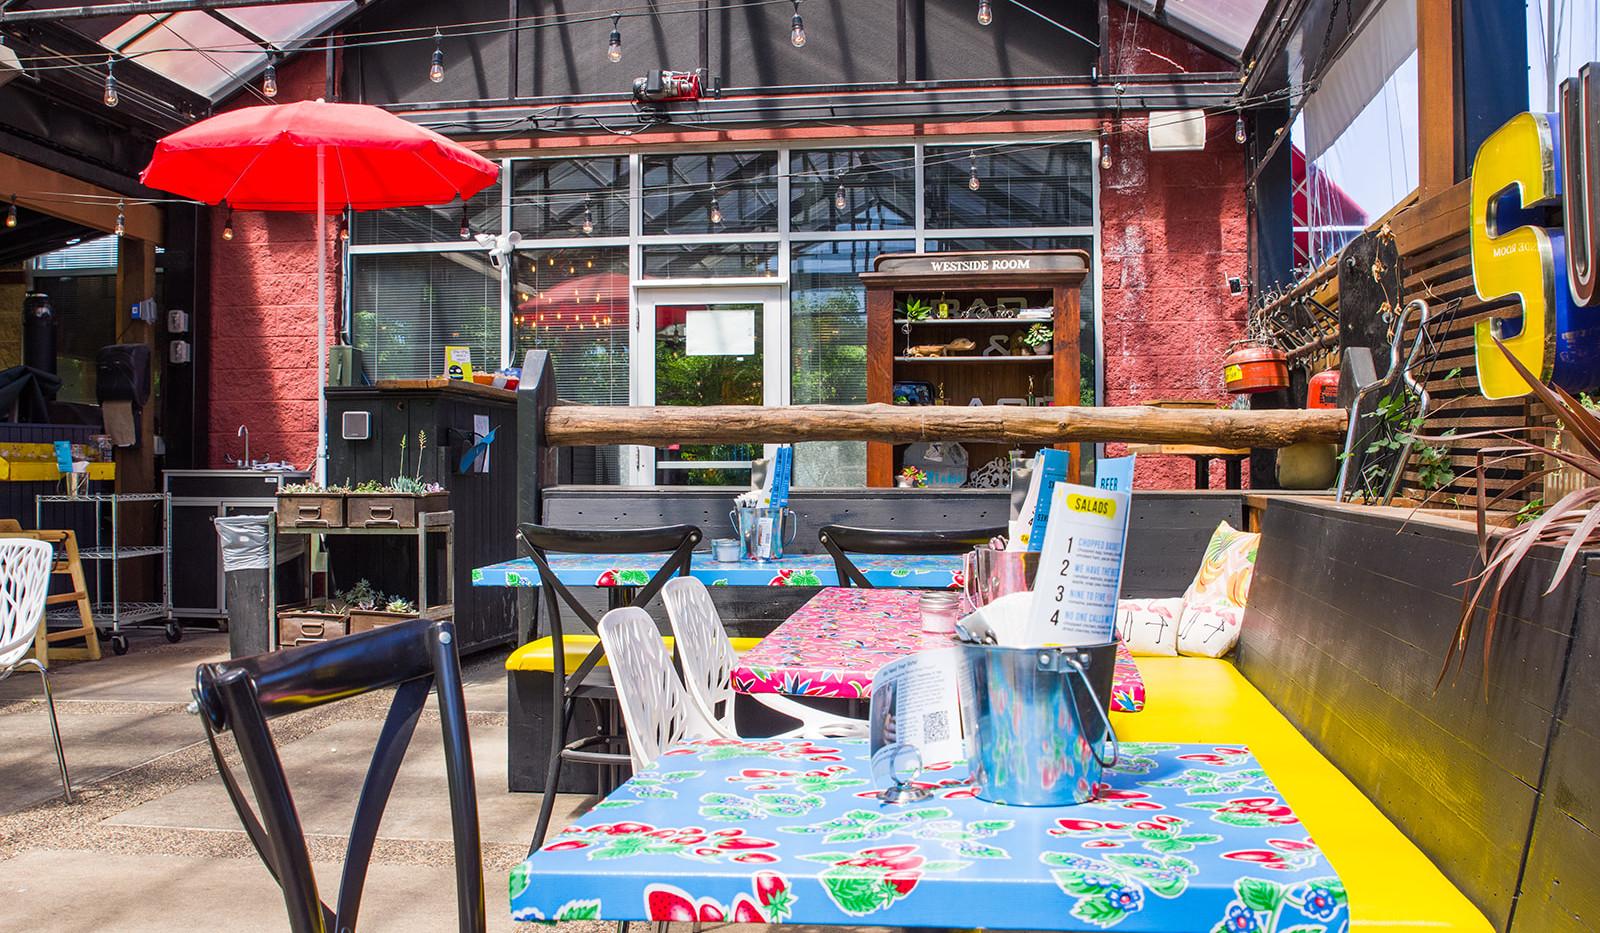 Hot Chip Burger Bar Outdoor Patio